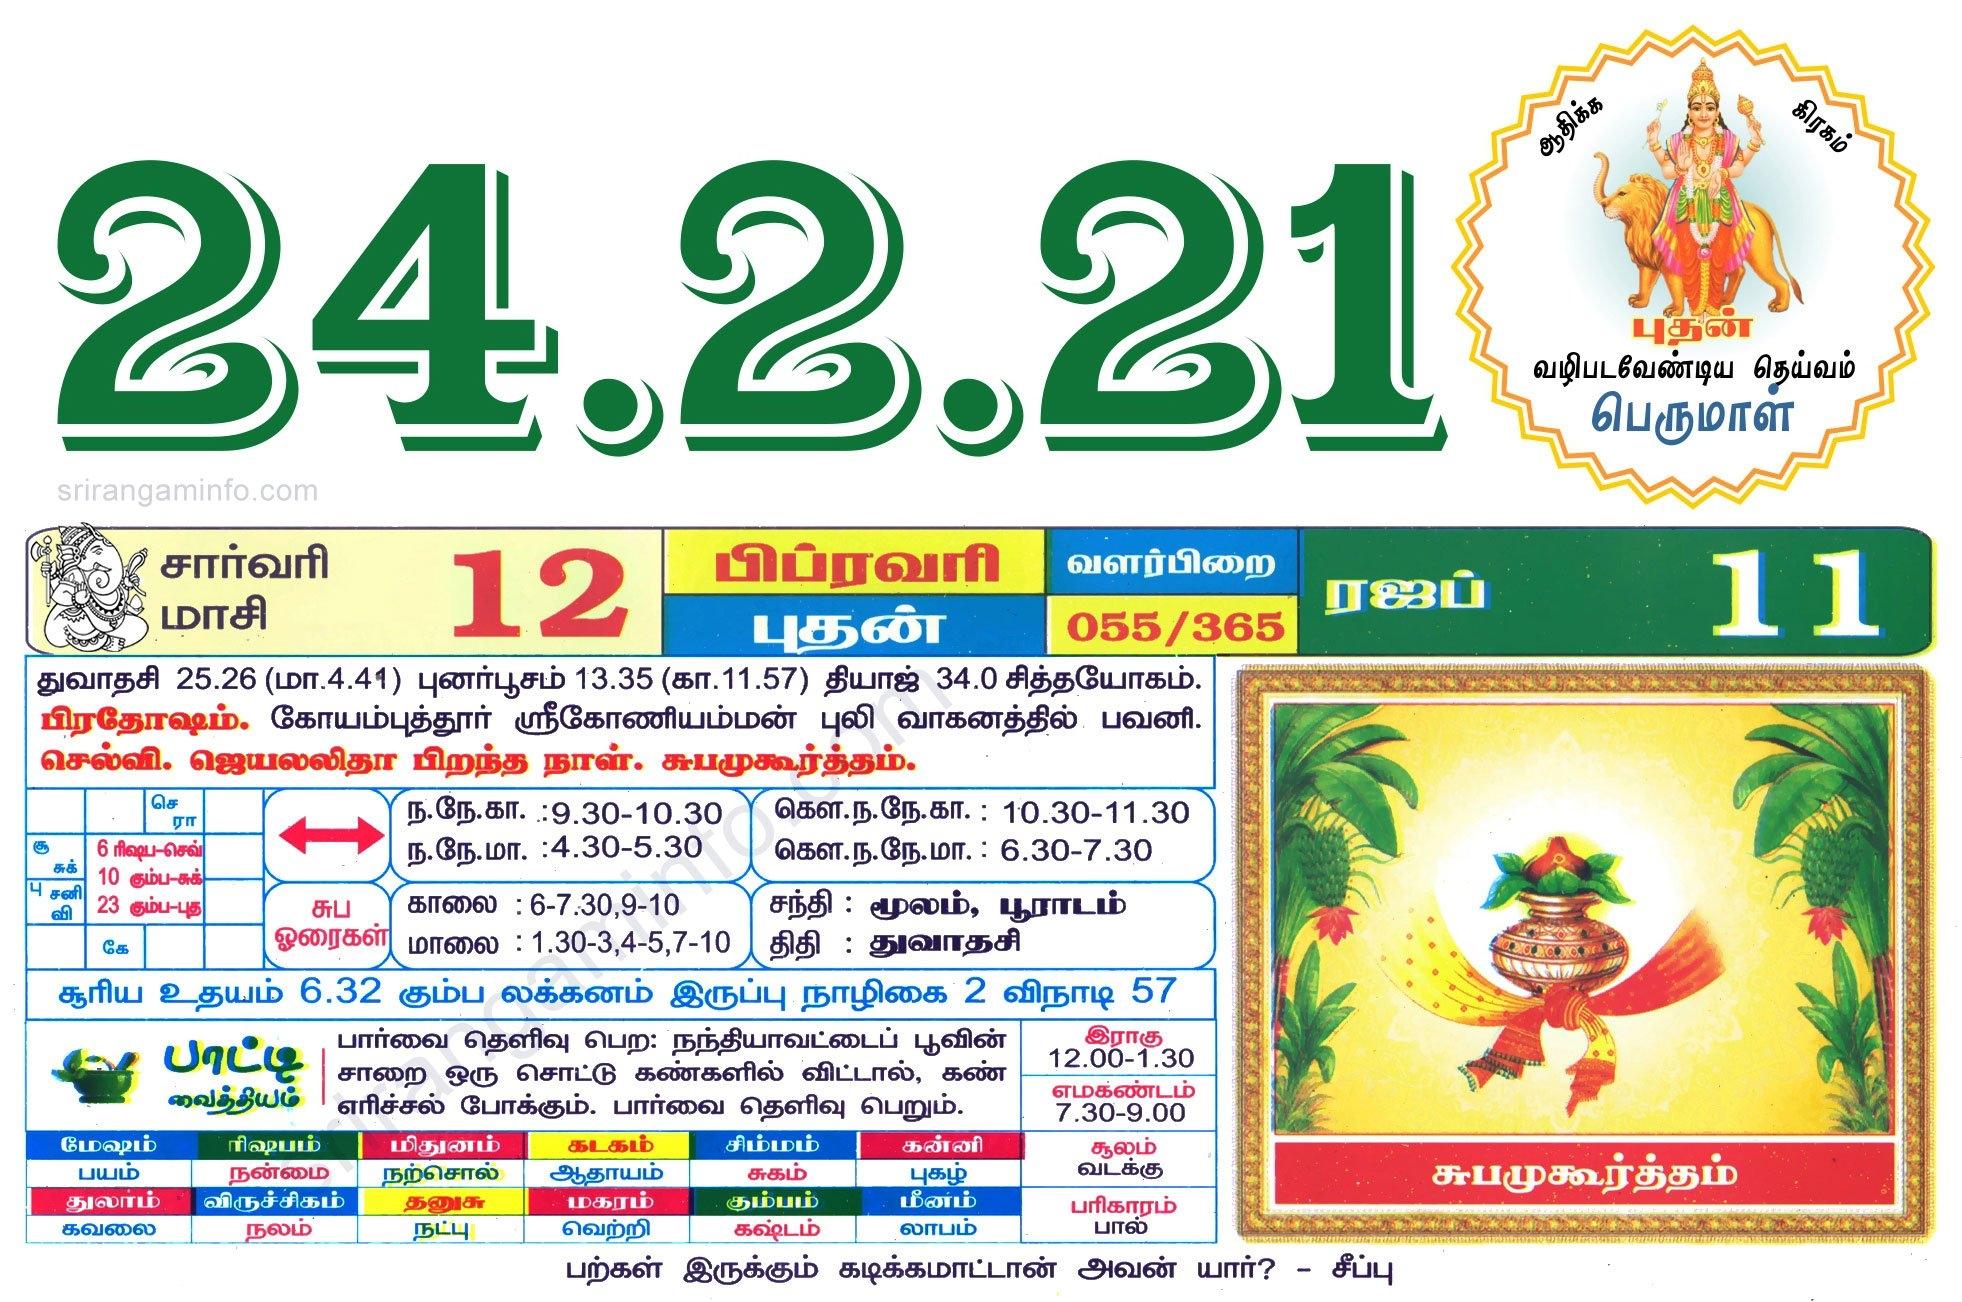 Tamil Daily Calendar 2021, Tamil Calendar 2021, Nalla Neram - தமிழ் தினசரி காலண்டர் with Tamil Calendar 2021 Photos